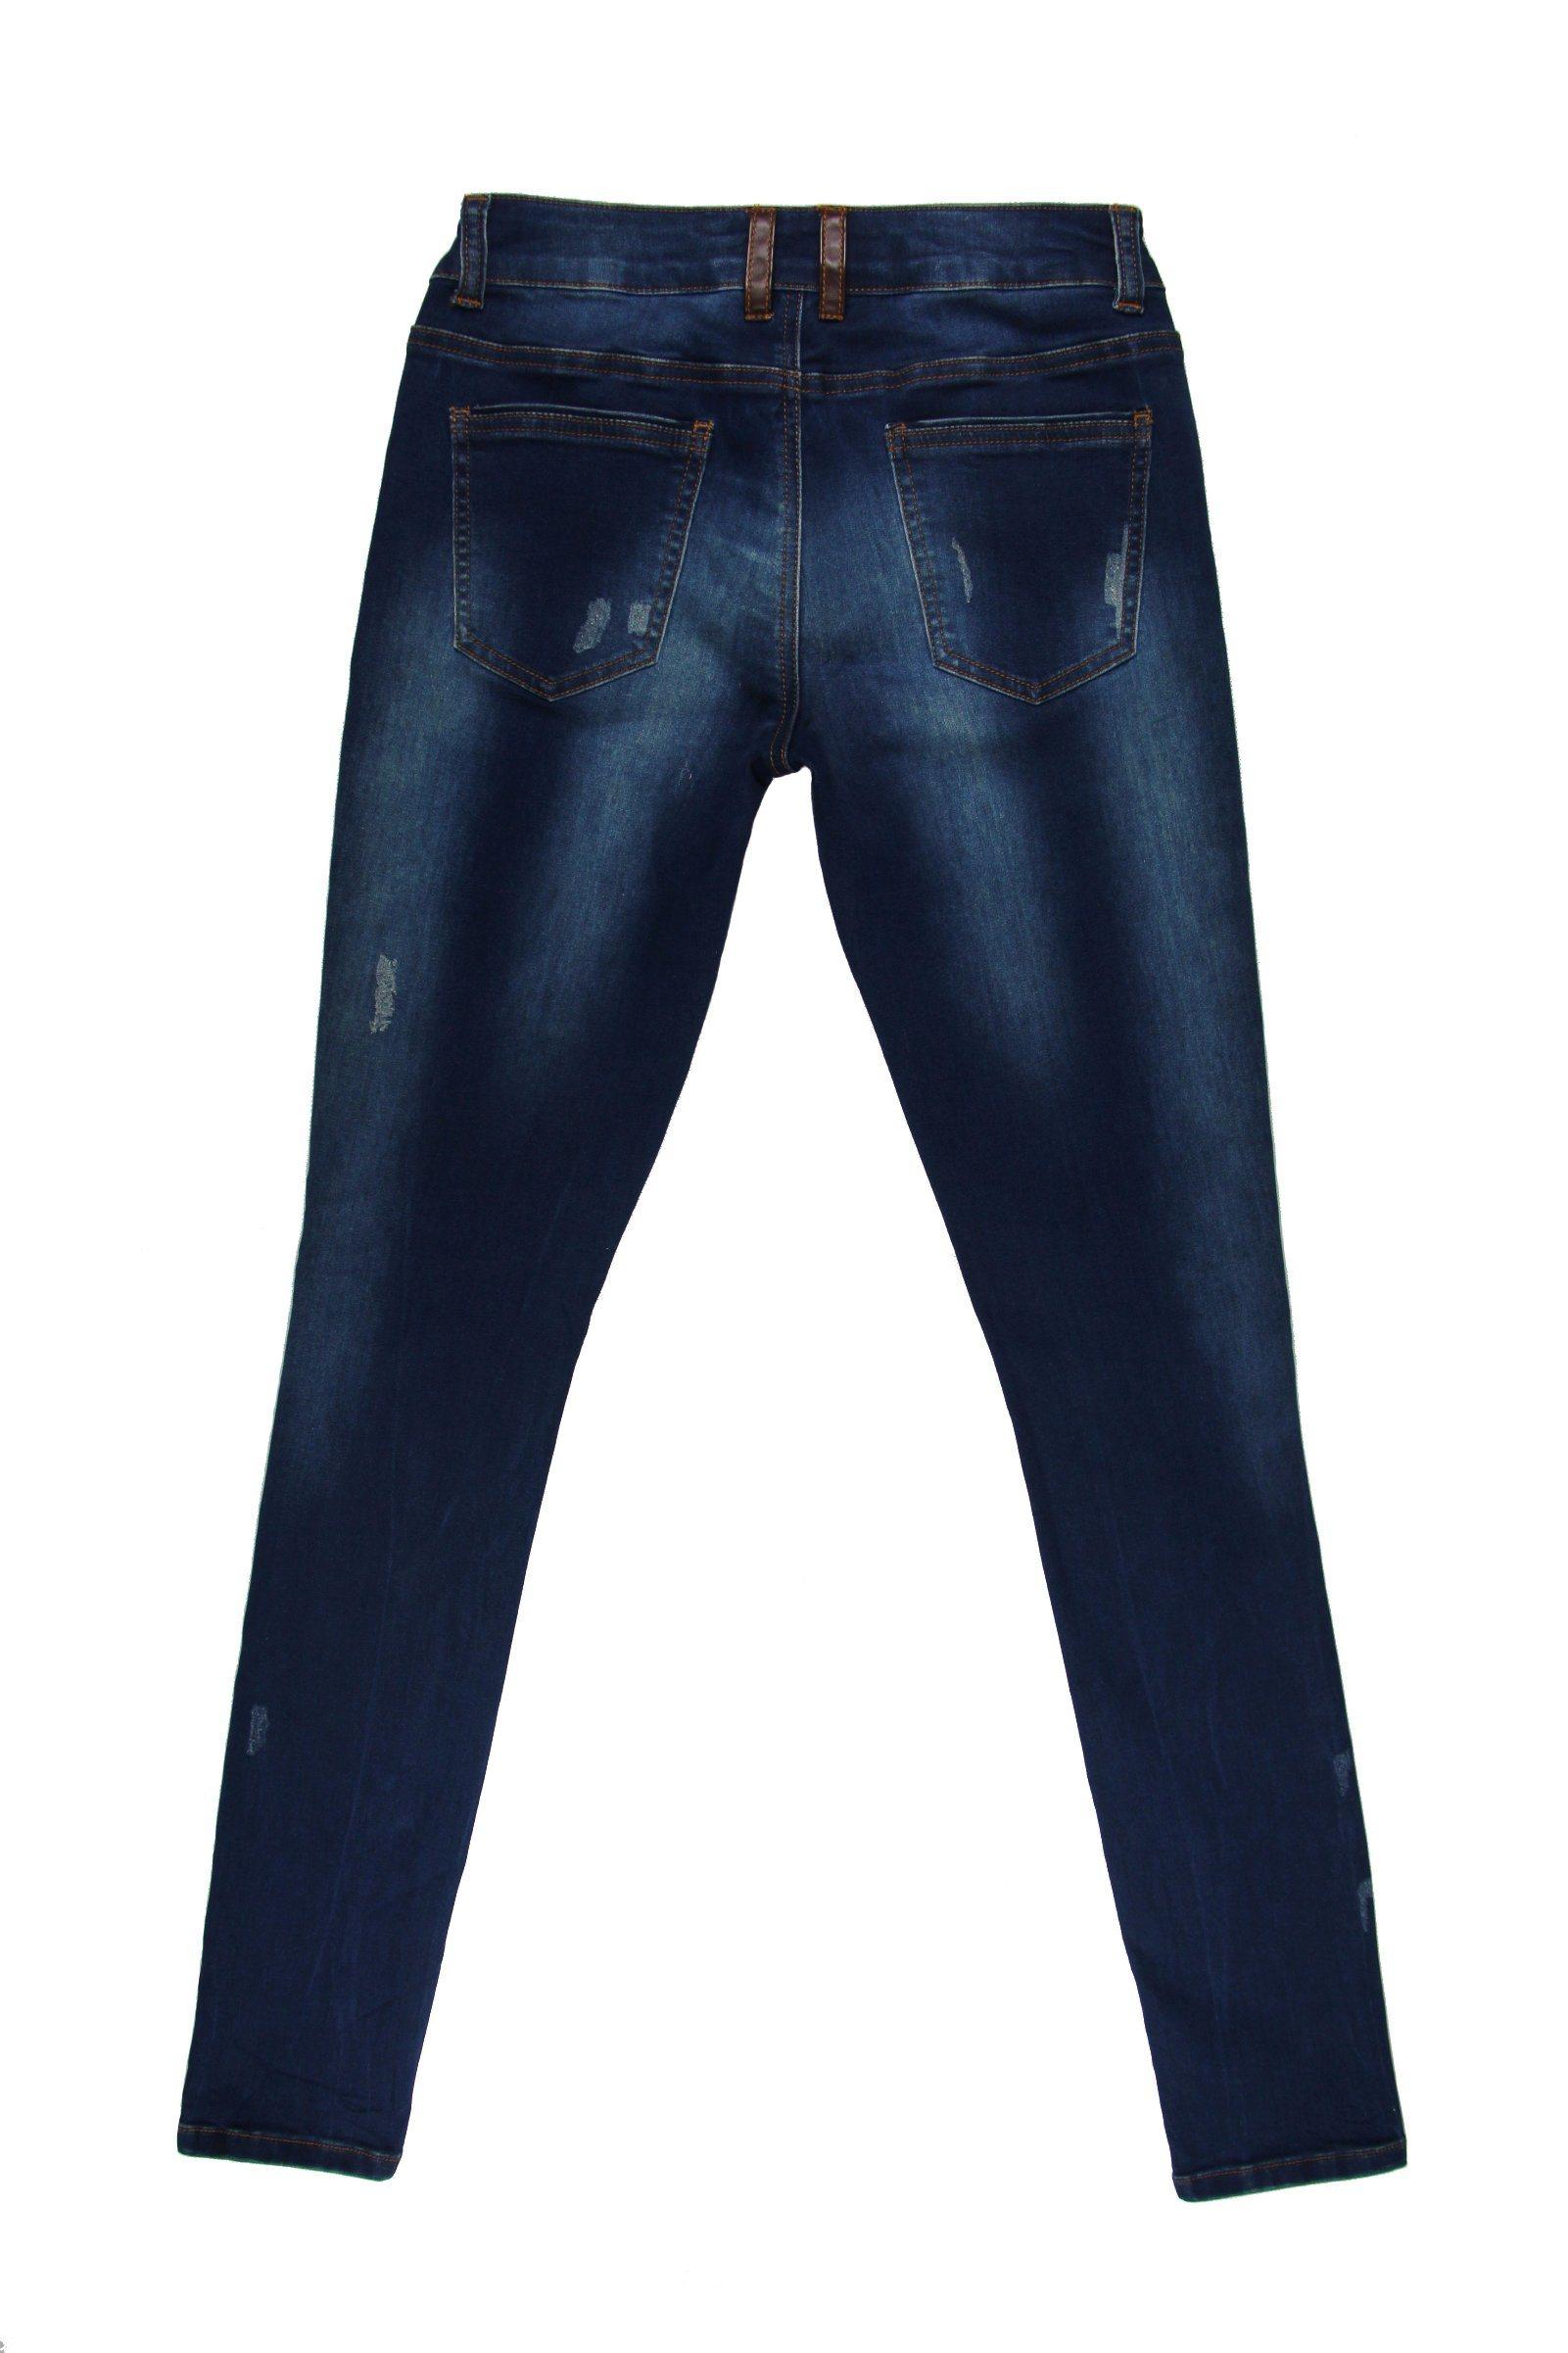 2017 Lady′s Summer Popular Hole Jeans (MYB05)